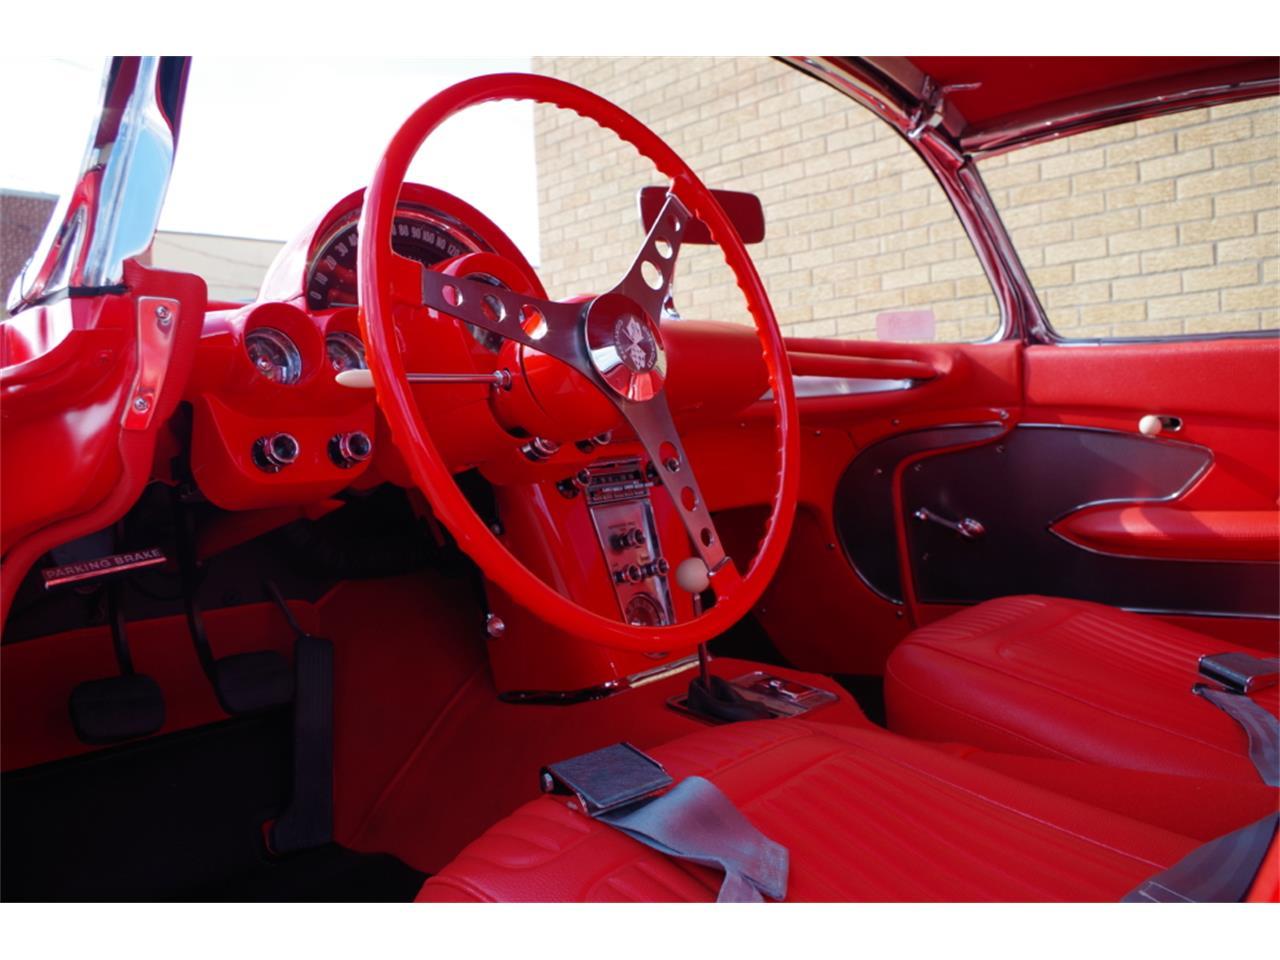 Large Picture of 1958 Chevrolet Corvette - $139,900.00 - R23F